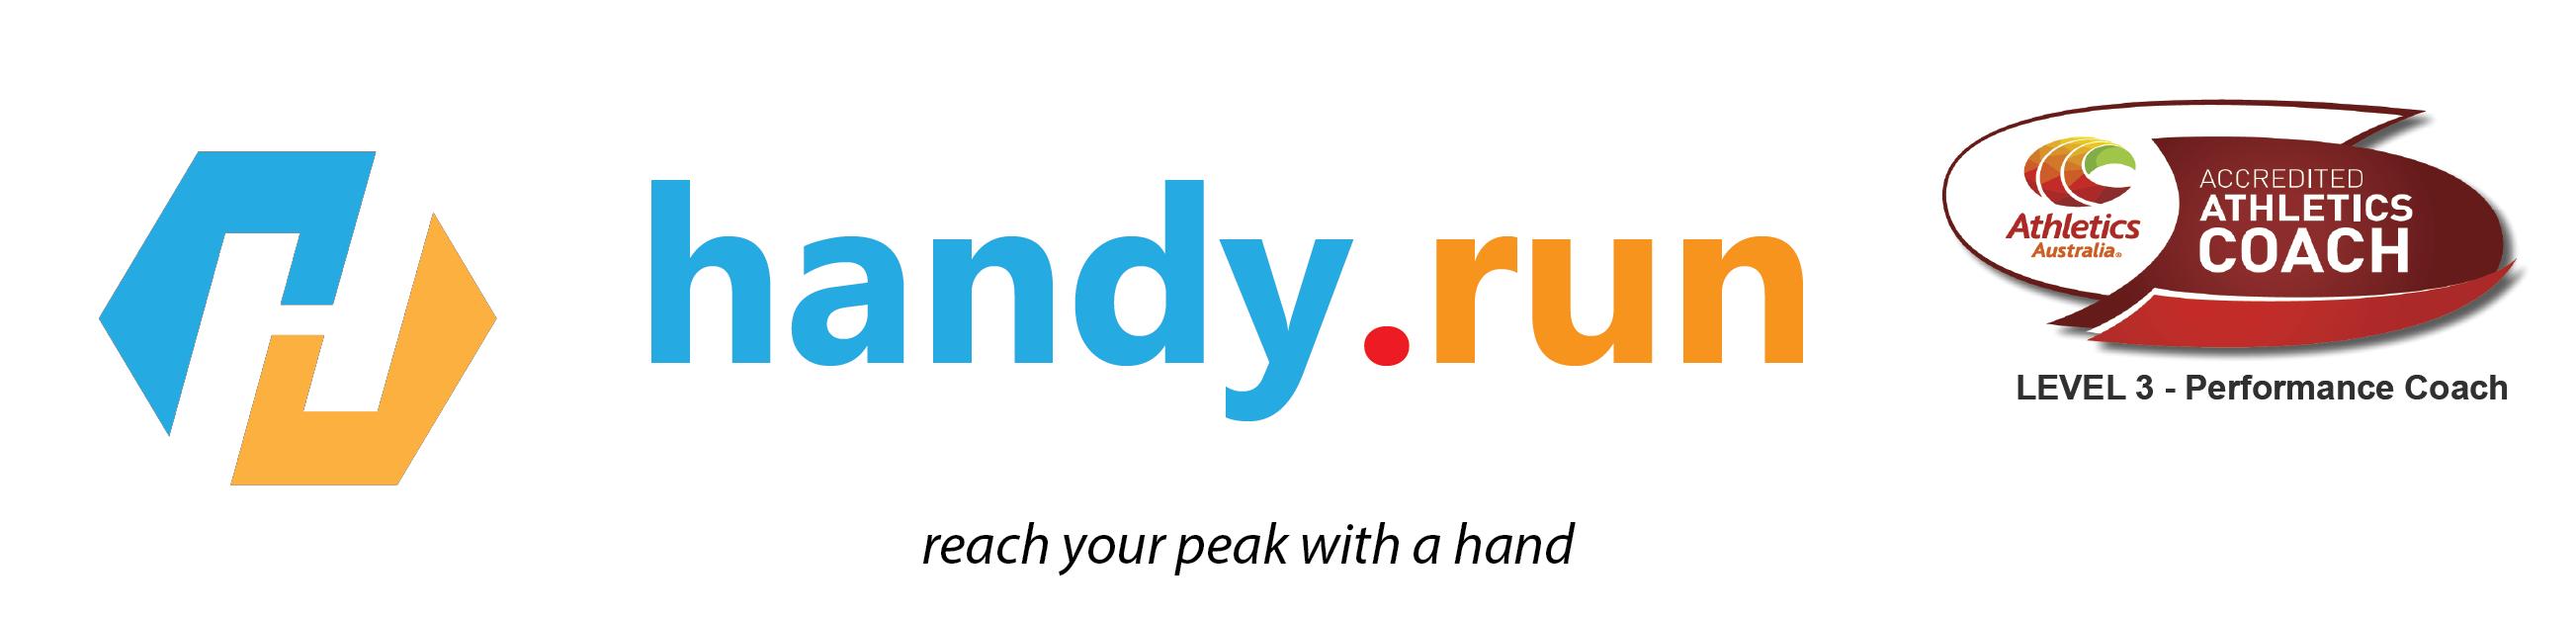 handy.run